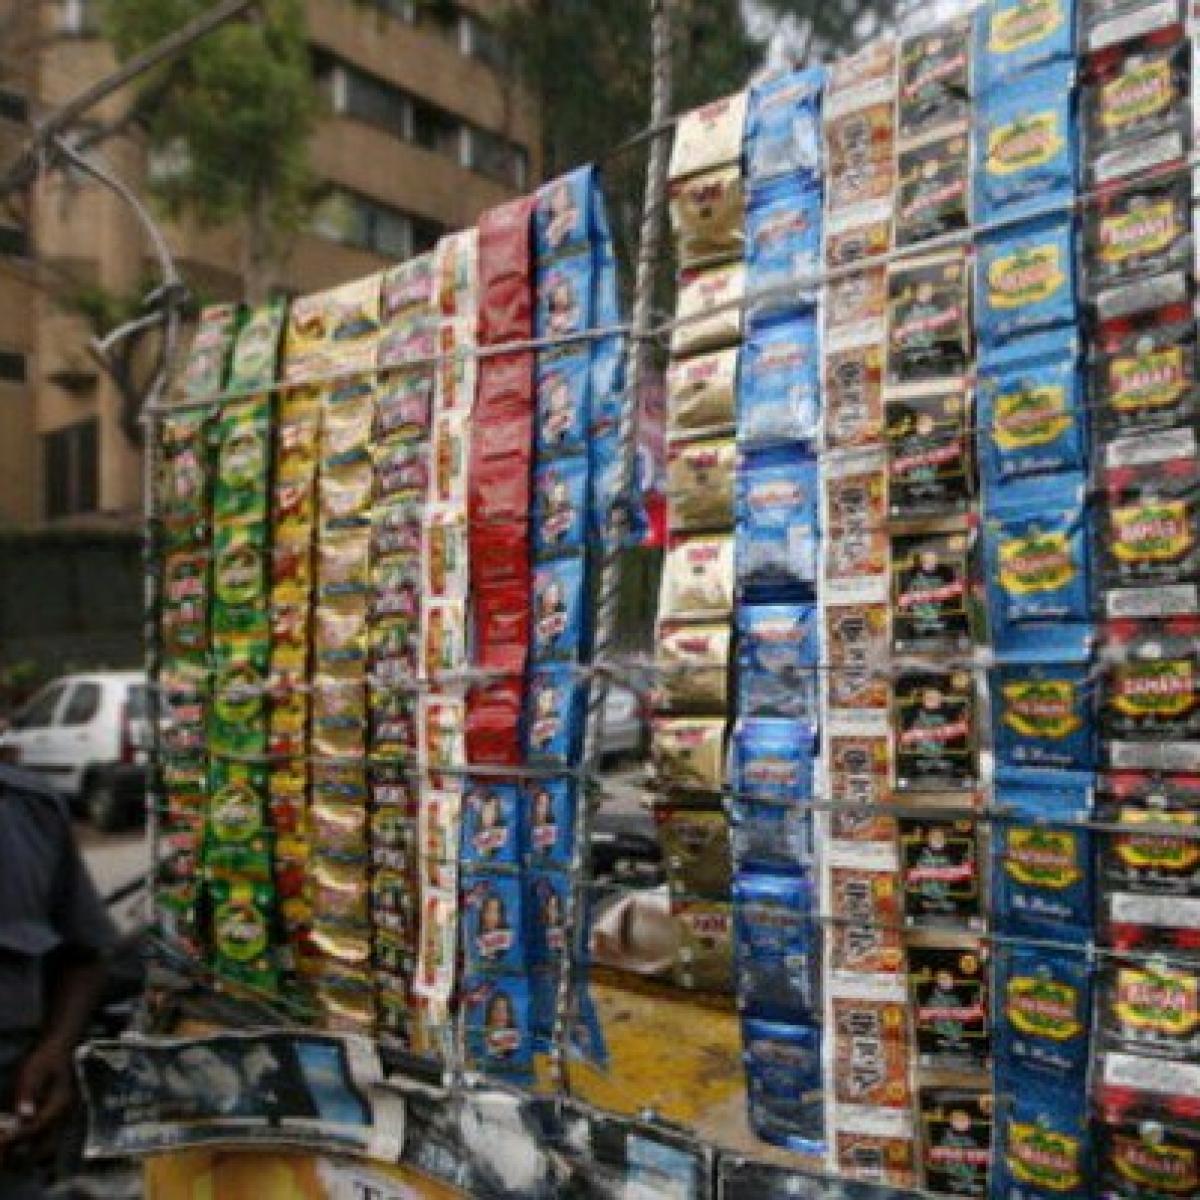 Mumbai Crime: One held for selling Gutkha in lockdown